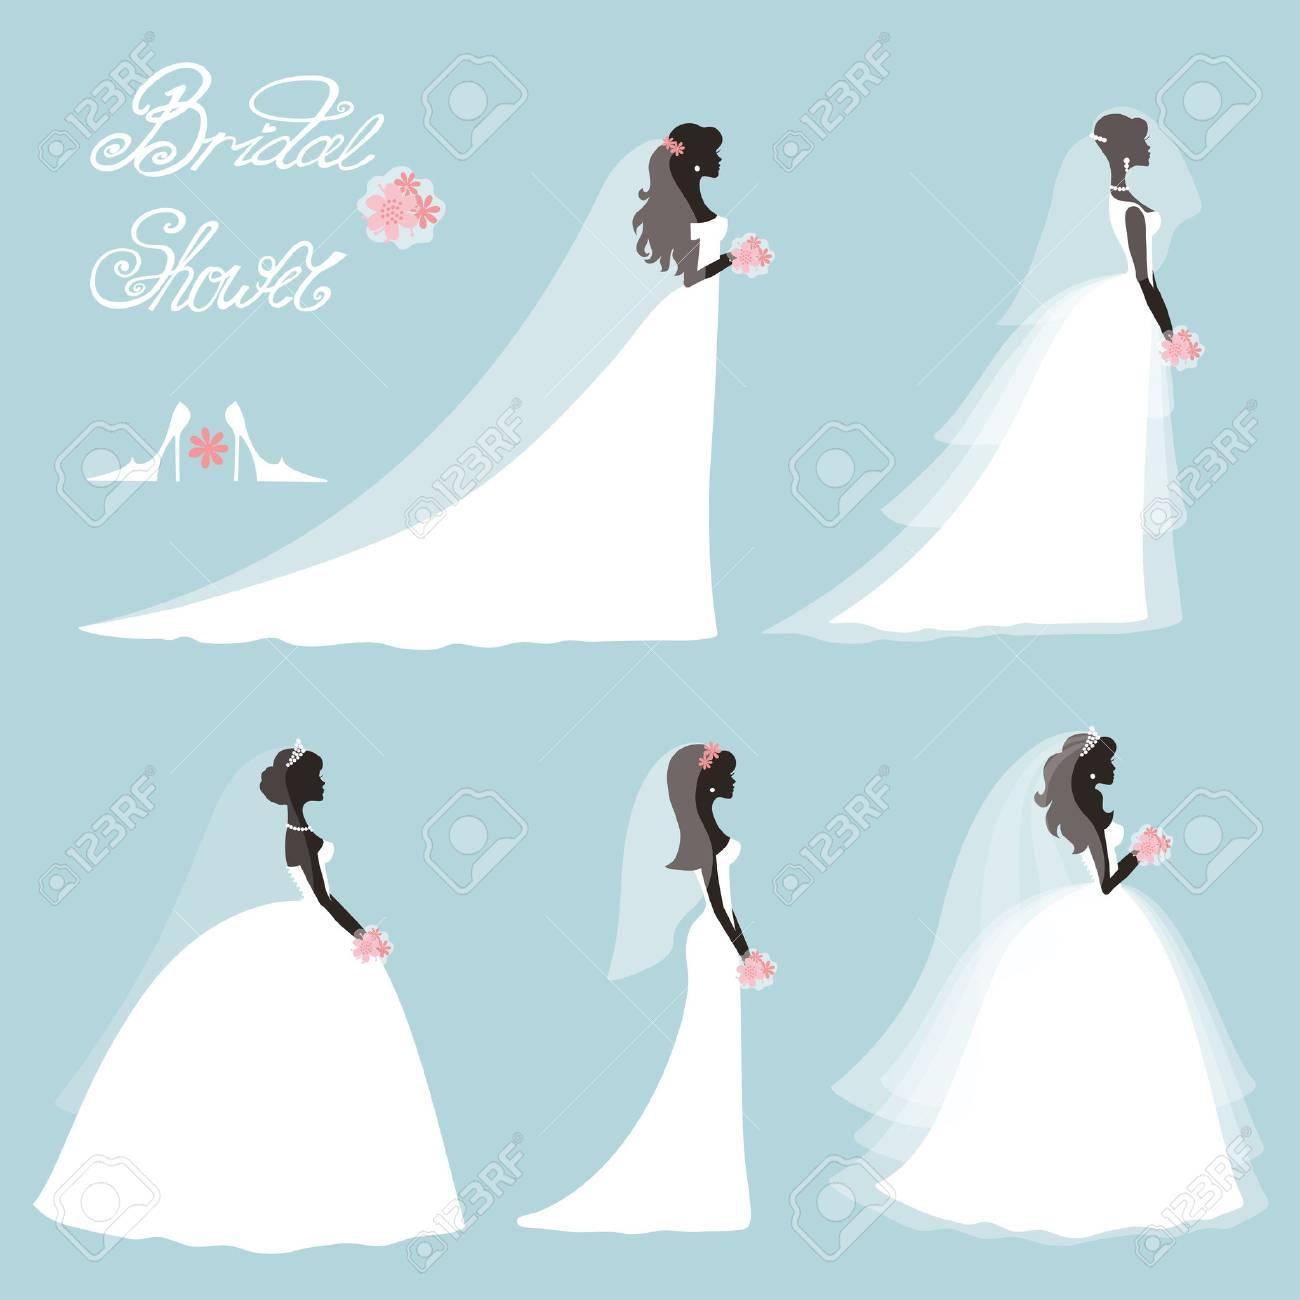 Wedding.Bride in Different dress style.Bridal shower decor set.Cartoon girl,woman silhouette,portrait,Swirling borders, ribbon,icons,label.Invitation Design template kit.Vintage Vector,flat fashion - 53450256